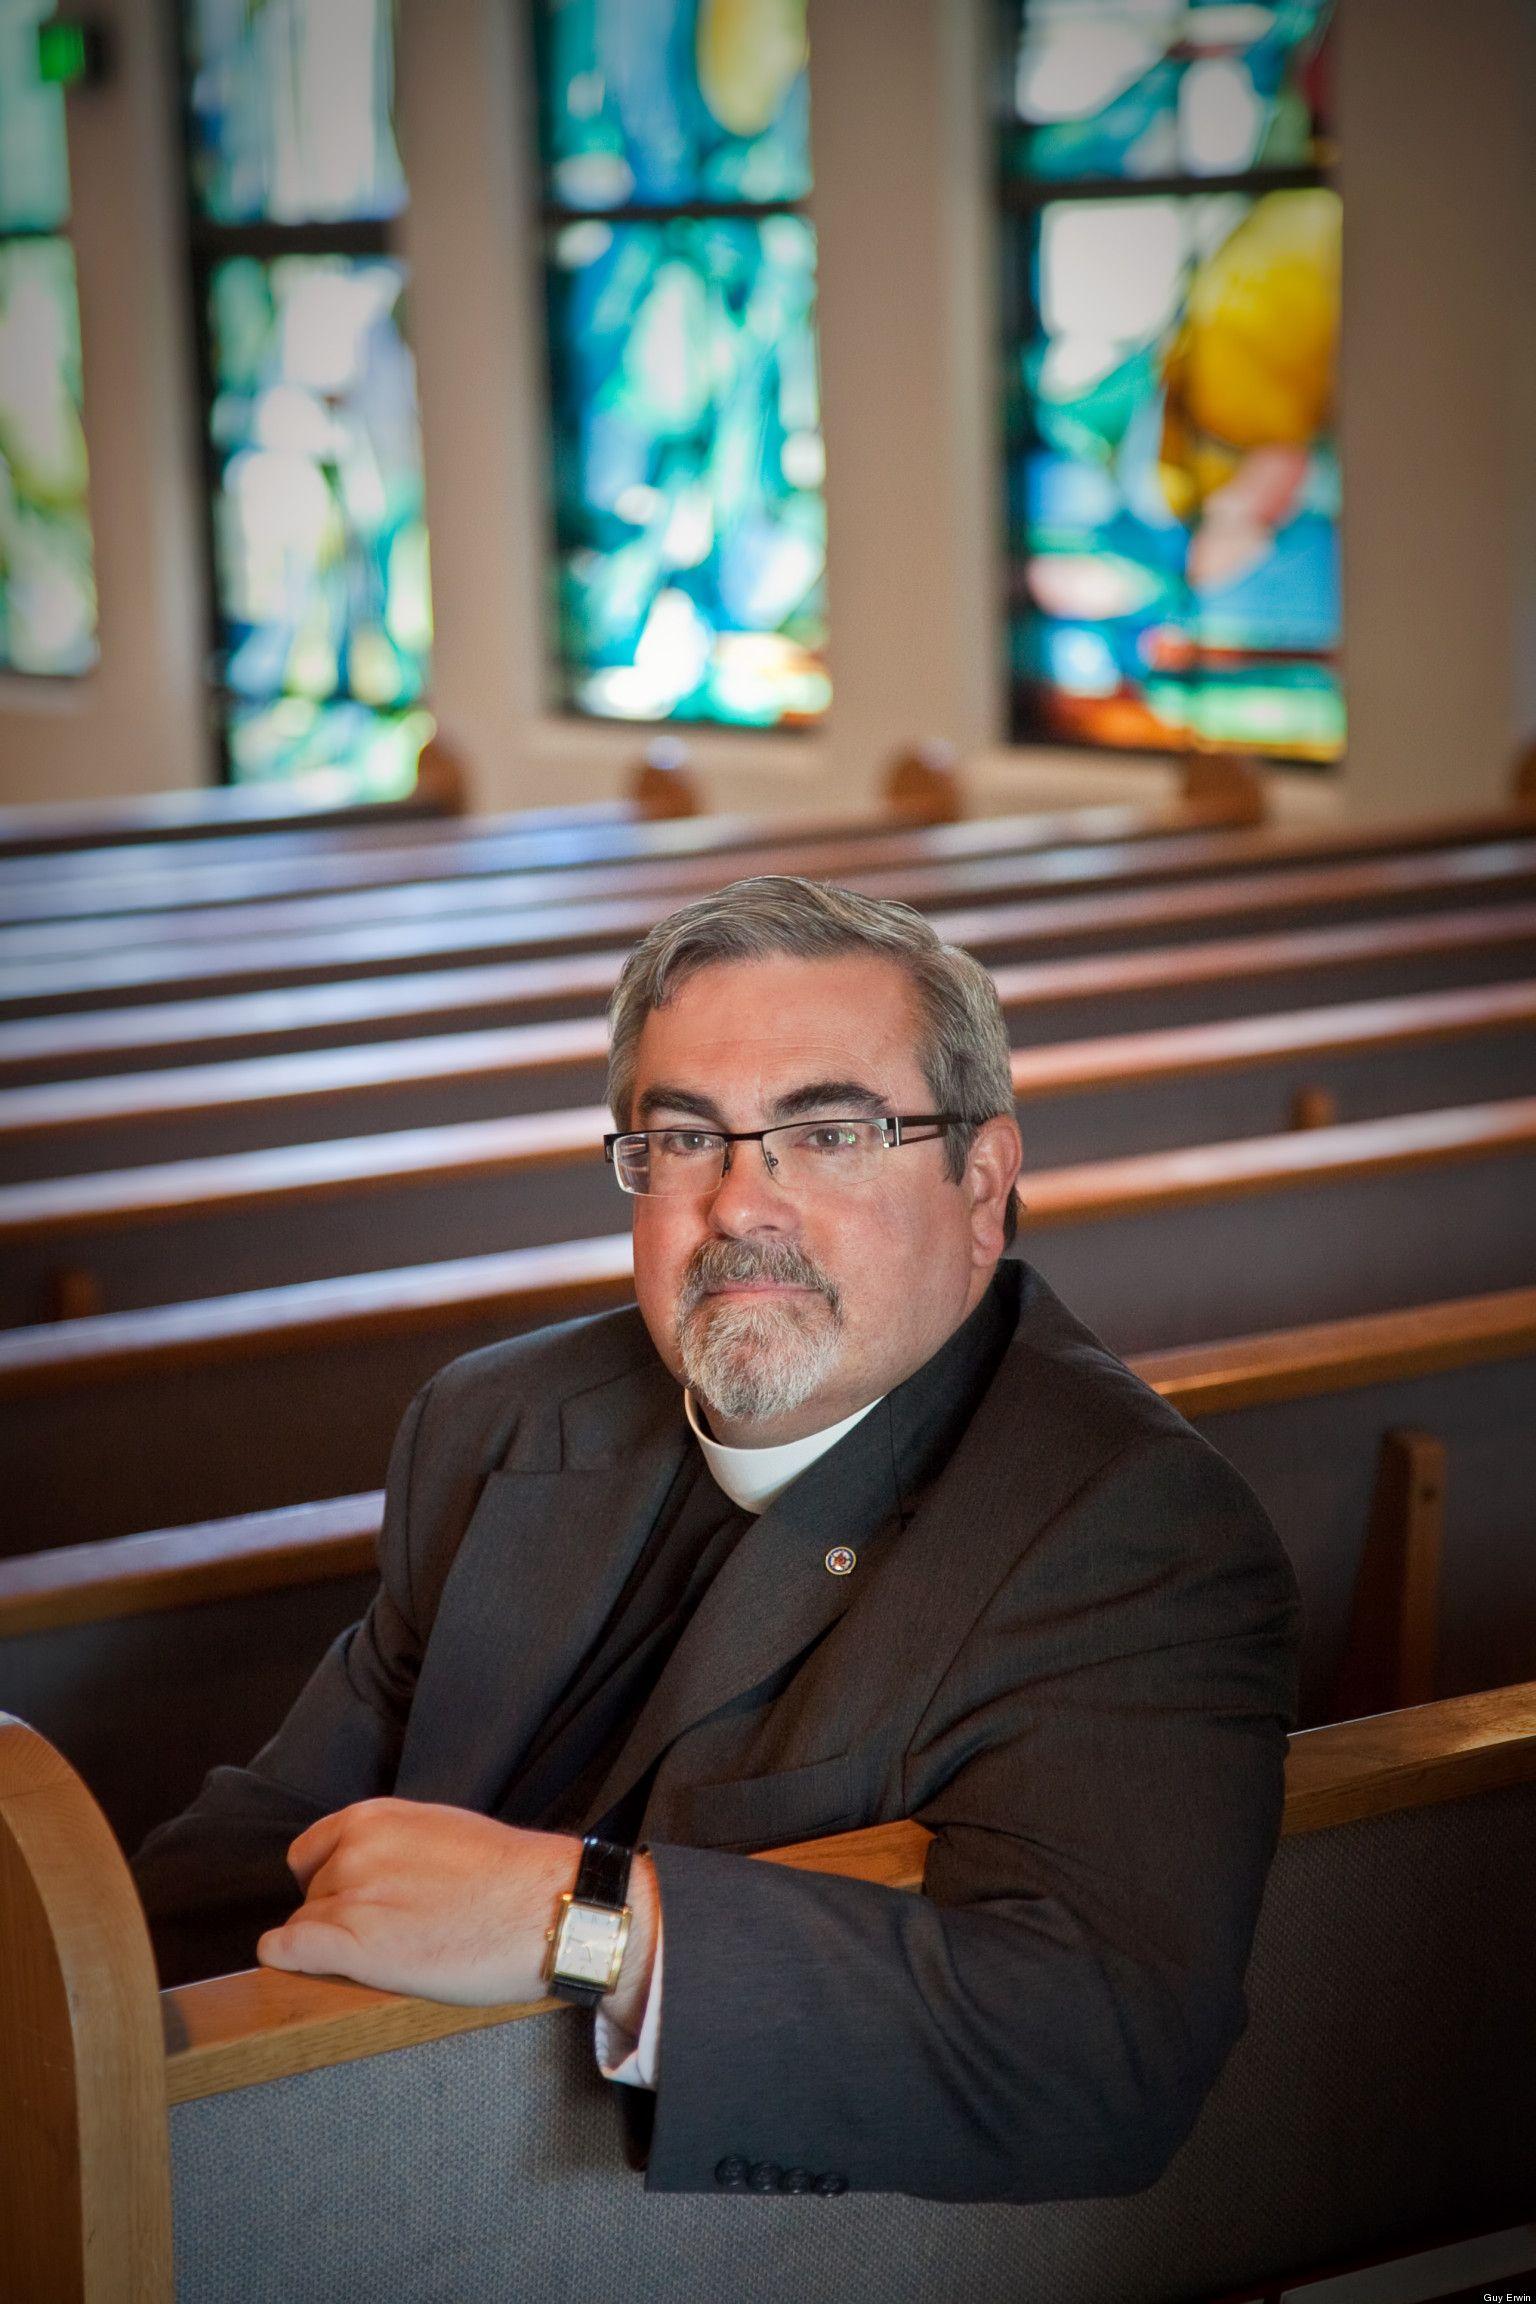 California gay bishop